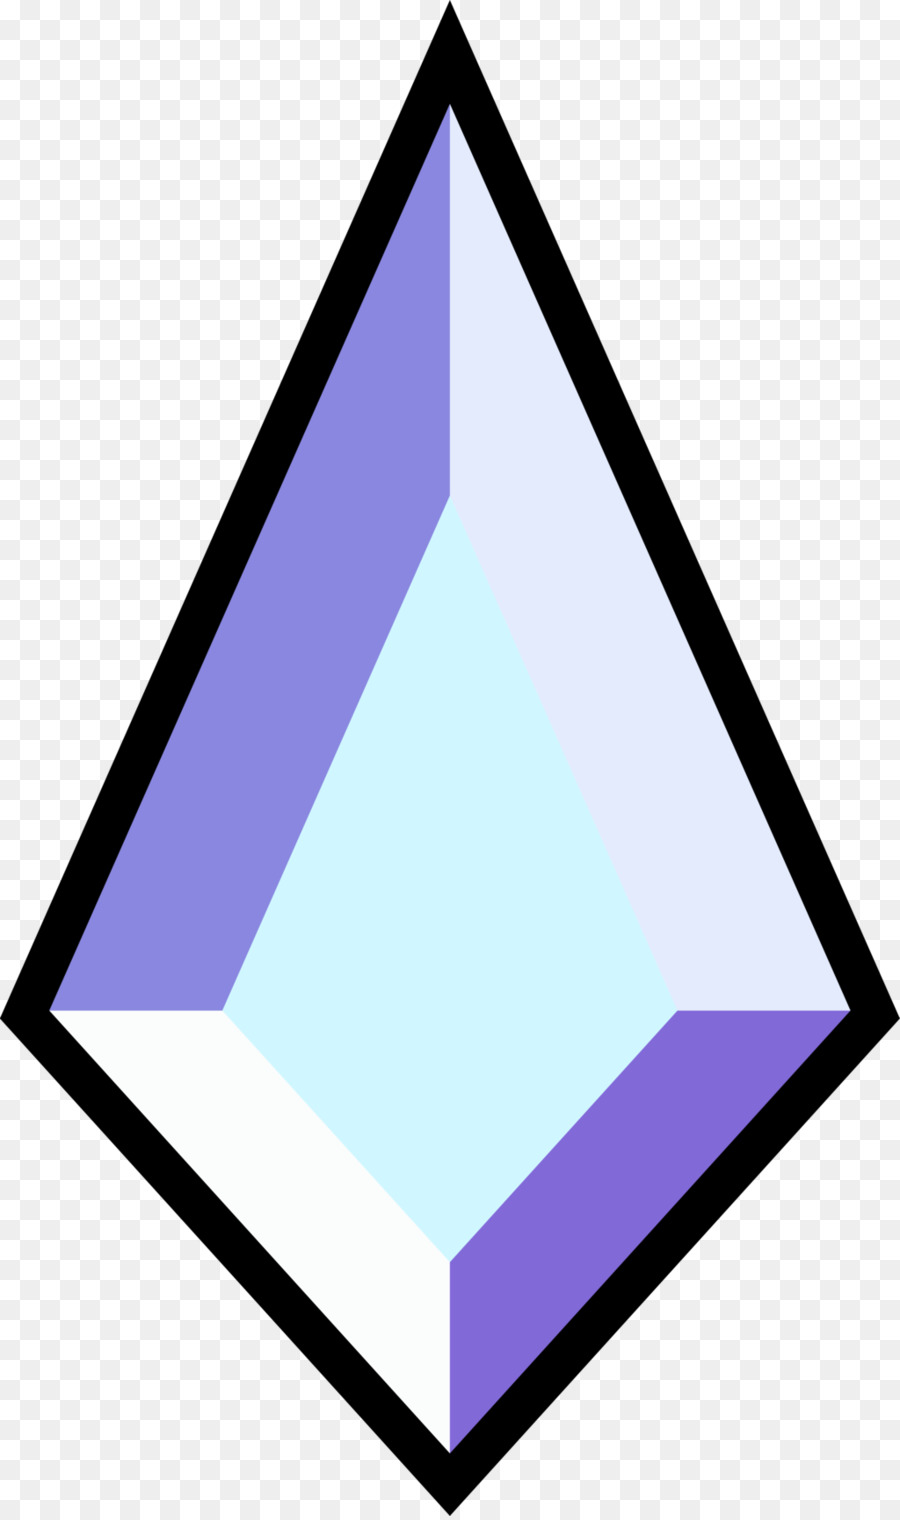 Gem clipart triangle. Diamond background square